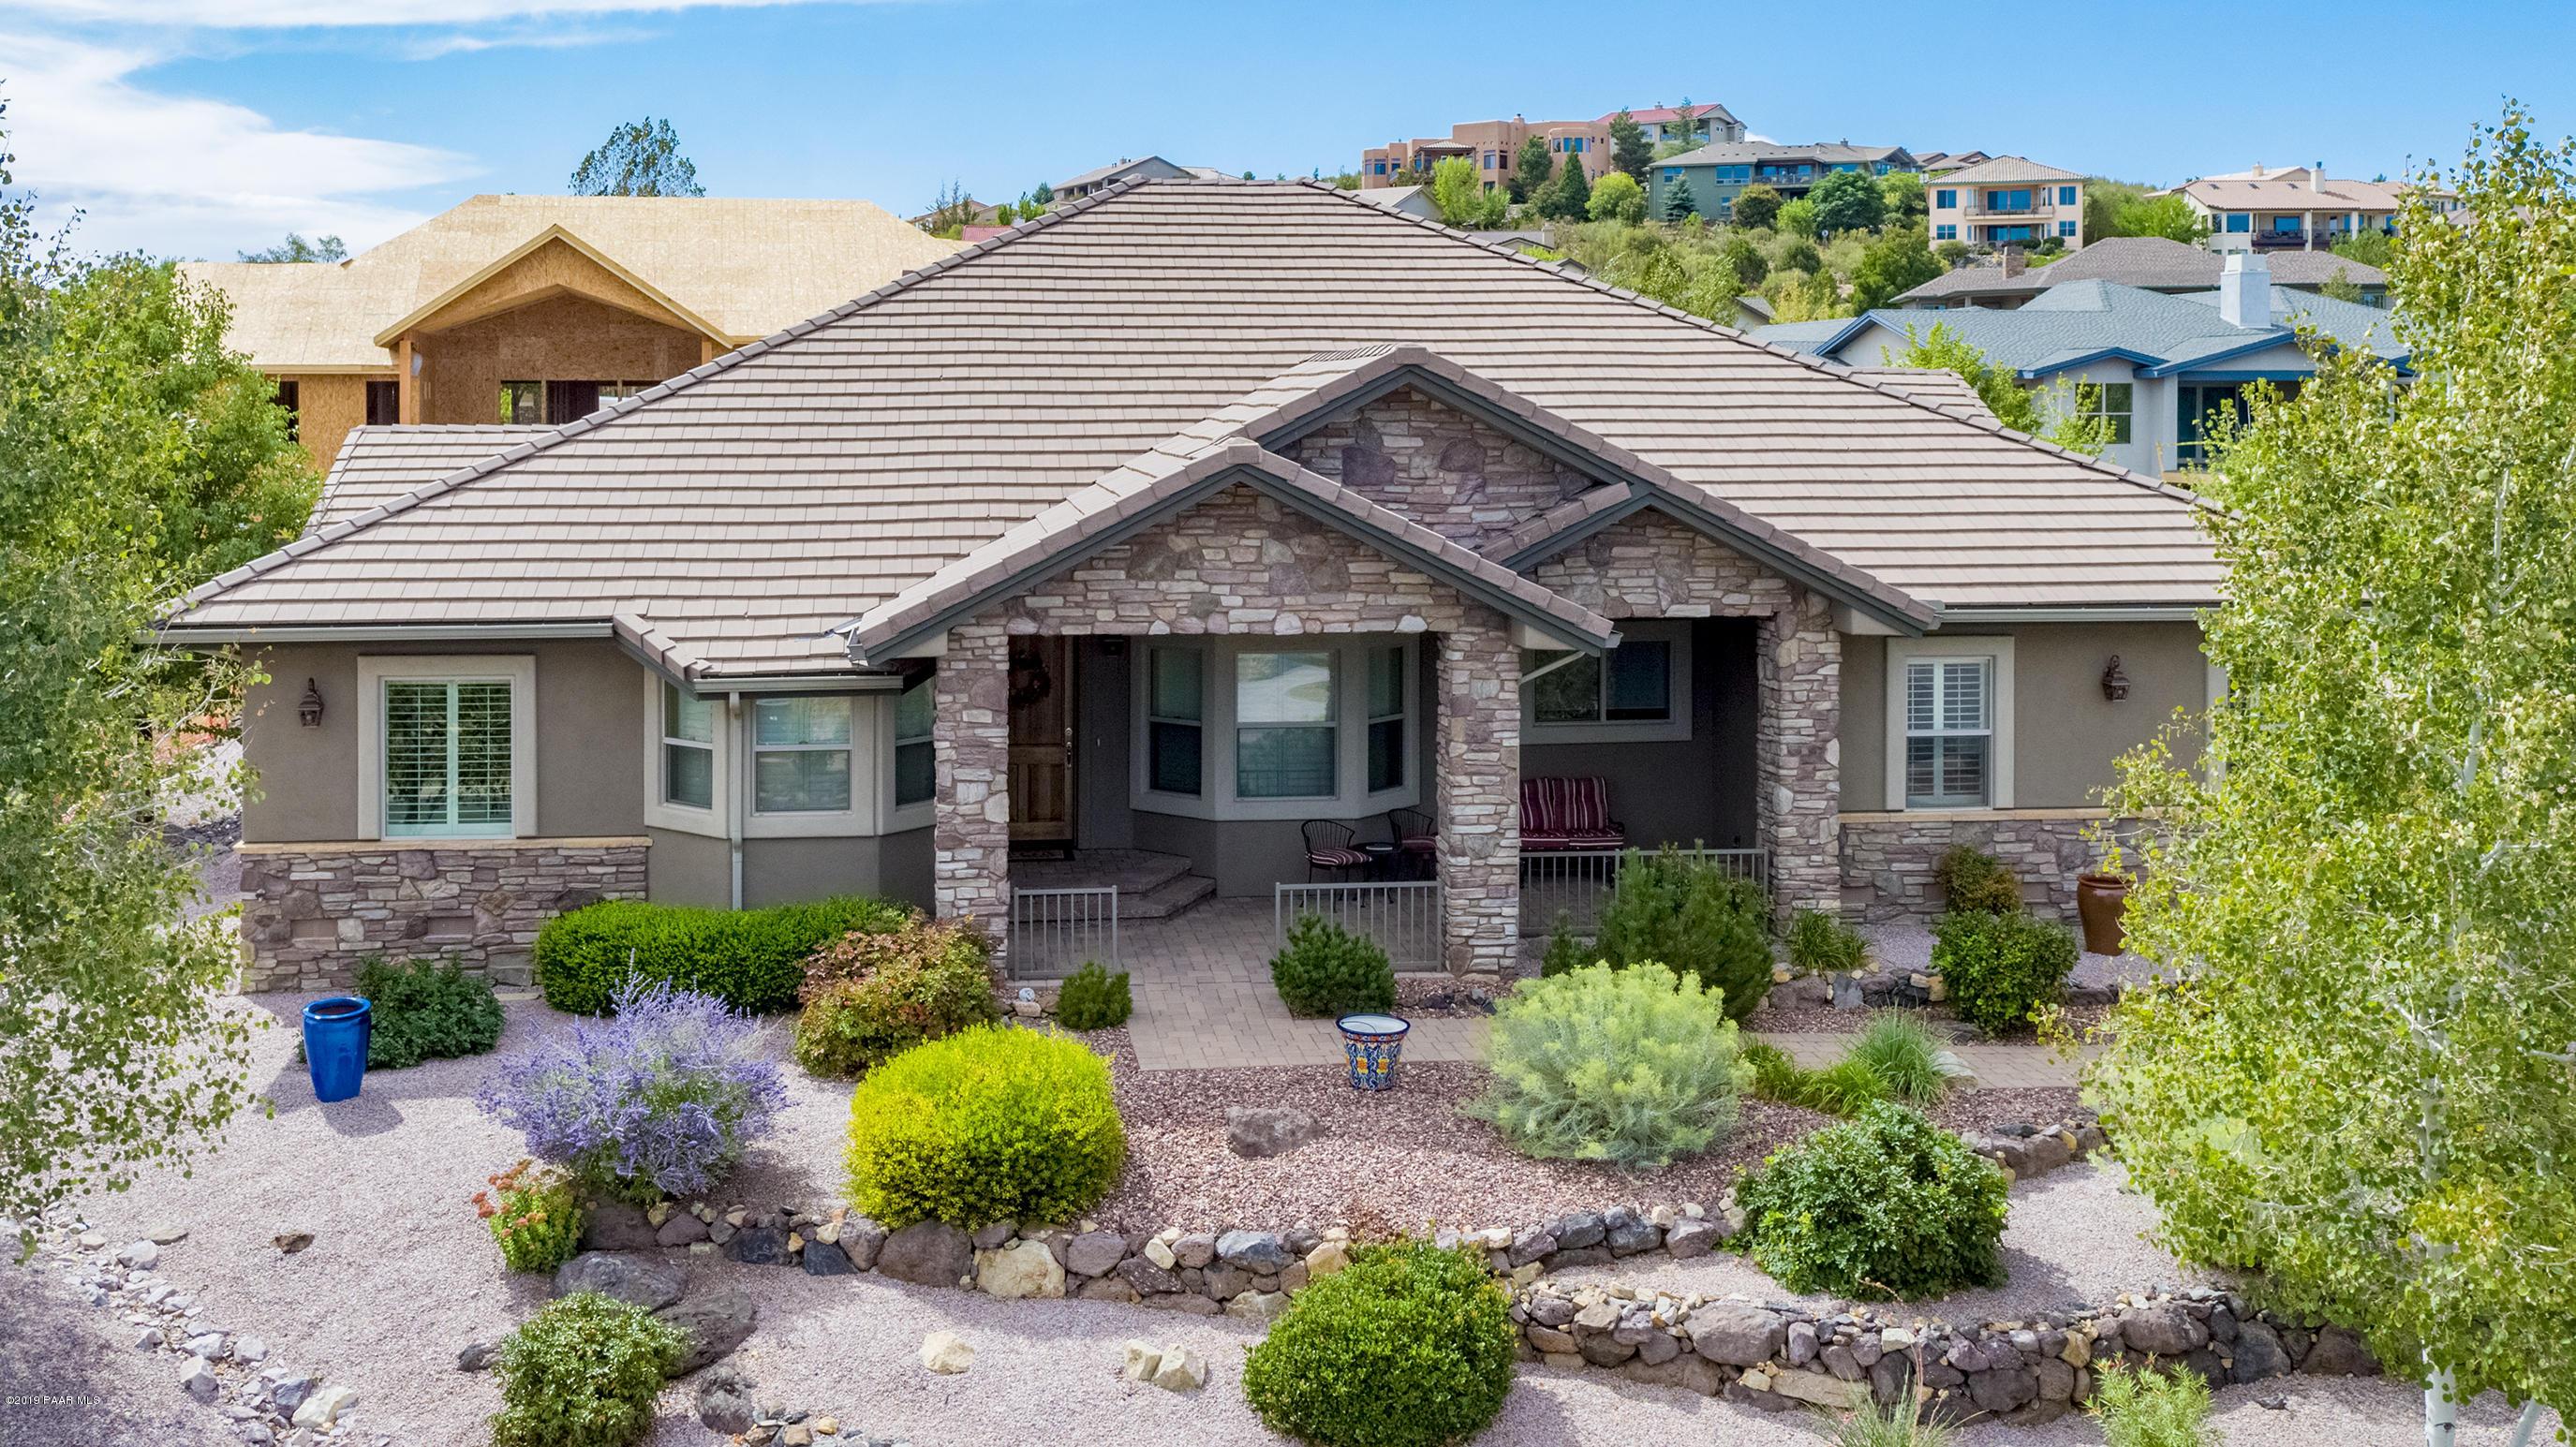 Photo of 1536 Belle Meade, Prescott, AZ 86301